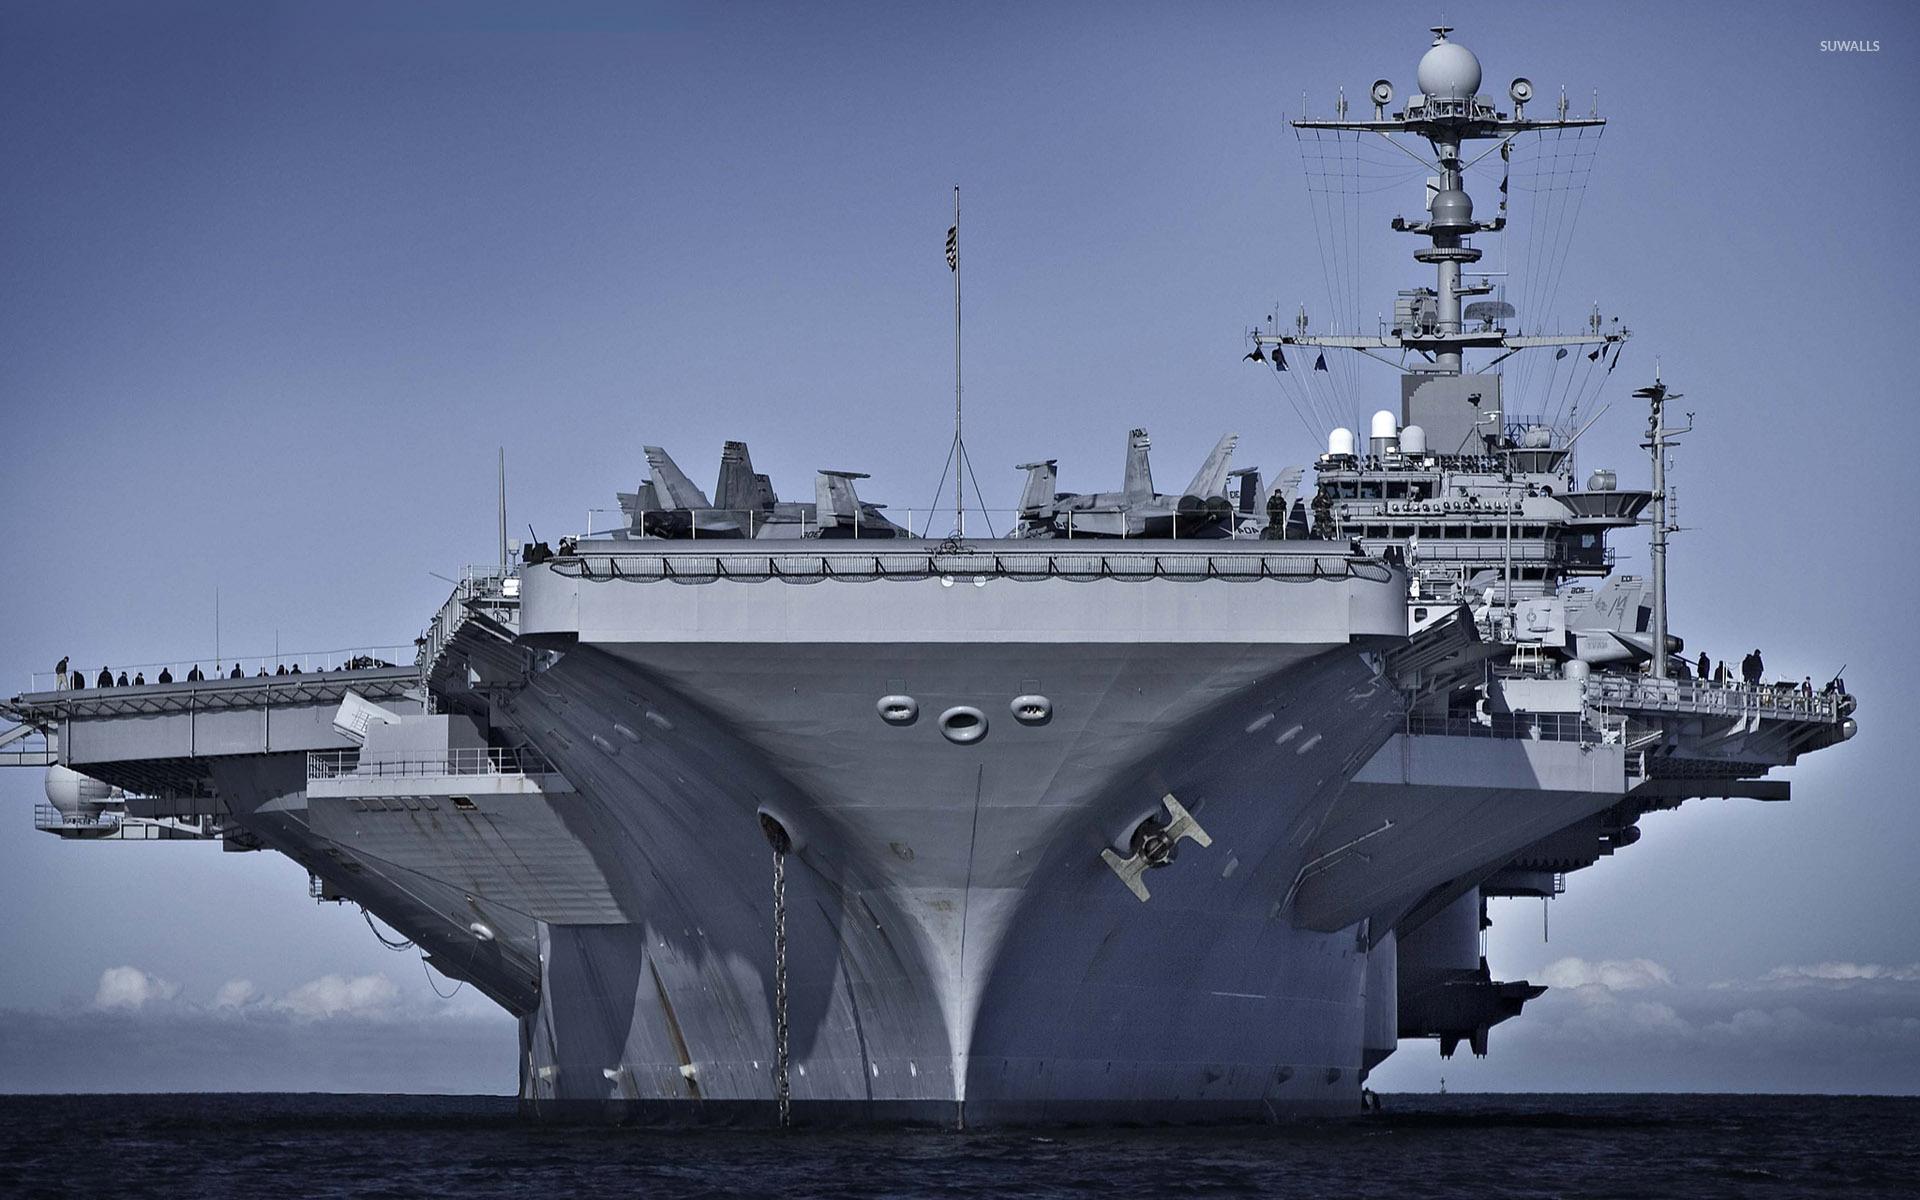 US Navy ship wallpaper   Photography wallpapers   28181 1920x1200